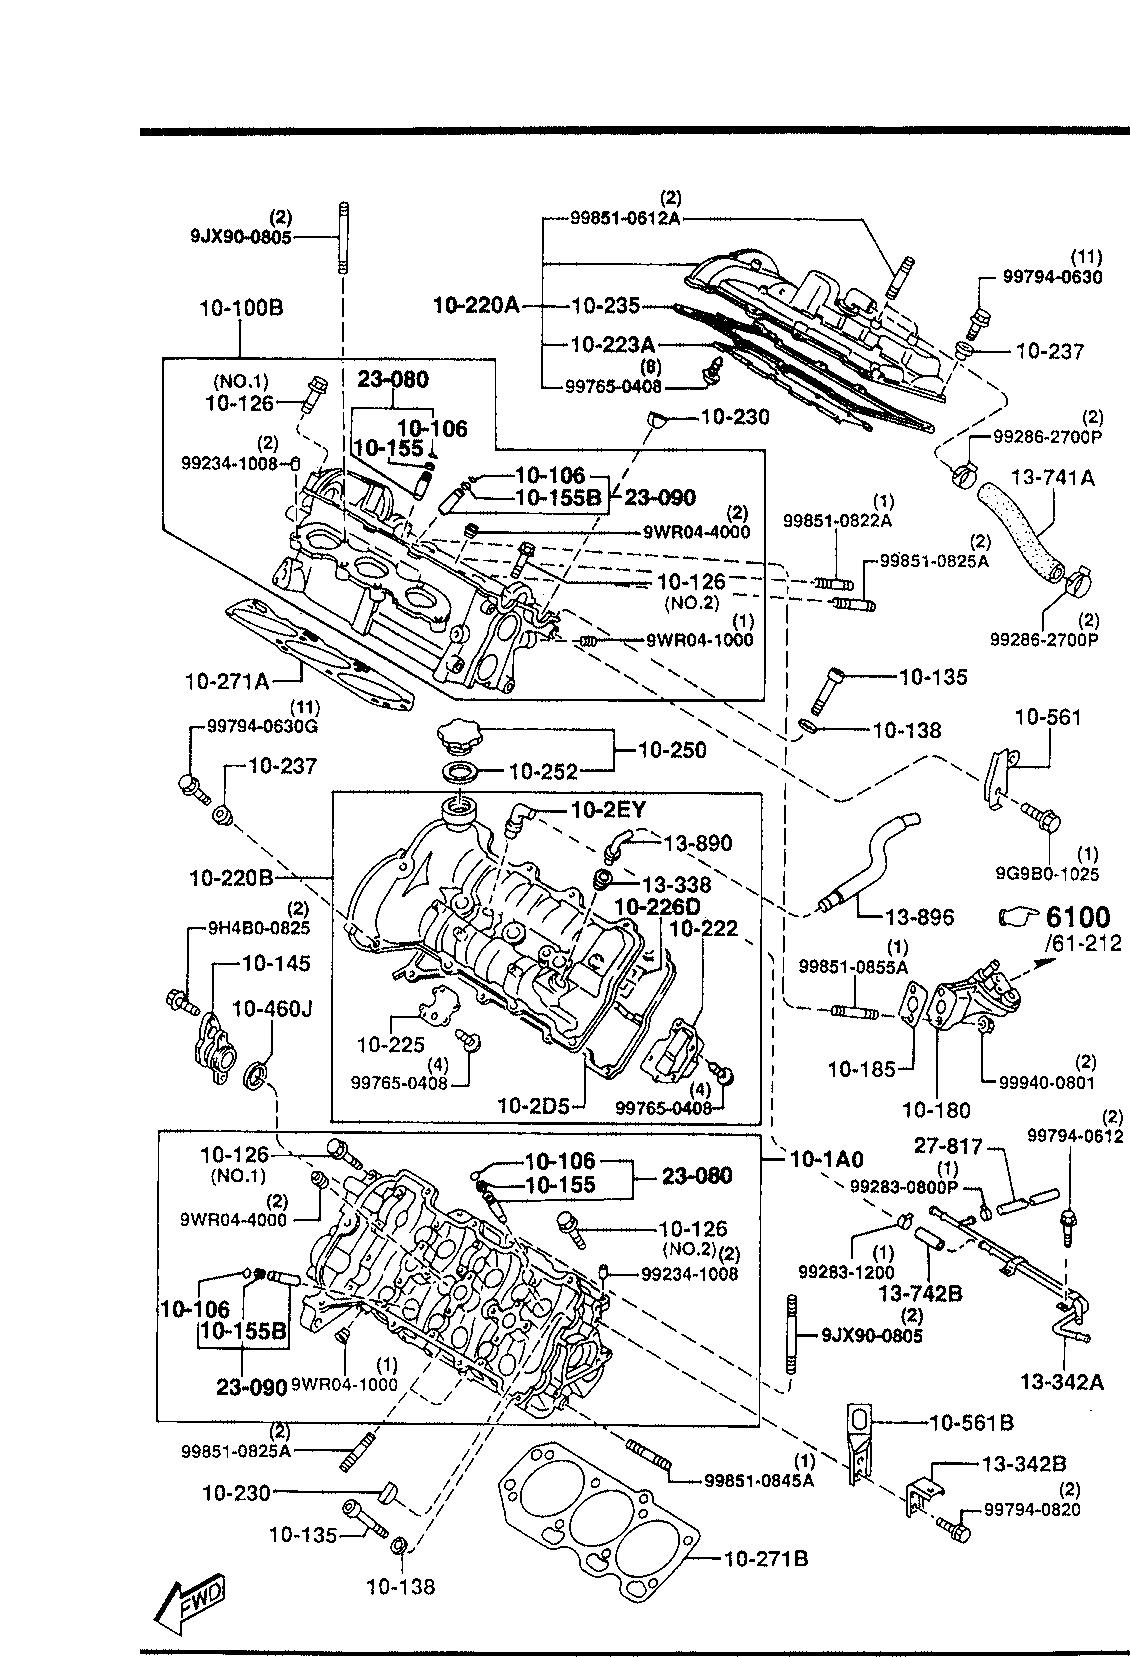 Usa 1998 Millenia Gasoline Engine V6 Cylinder Transmission 1010a Head Diagram List Of Parts